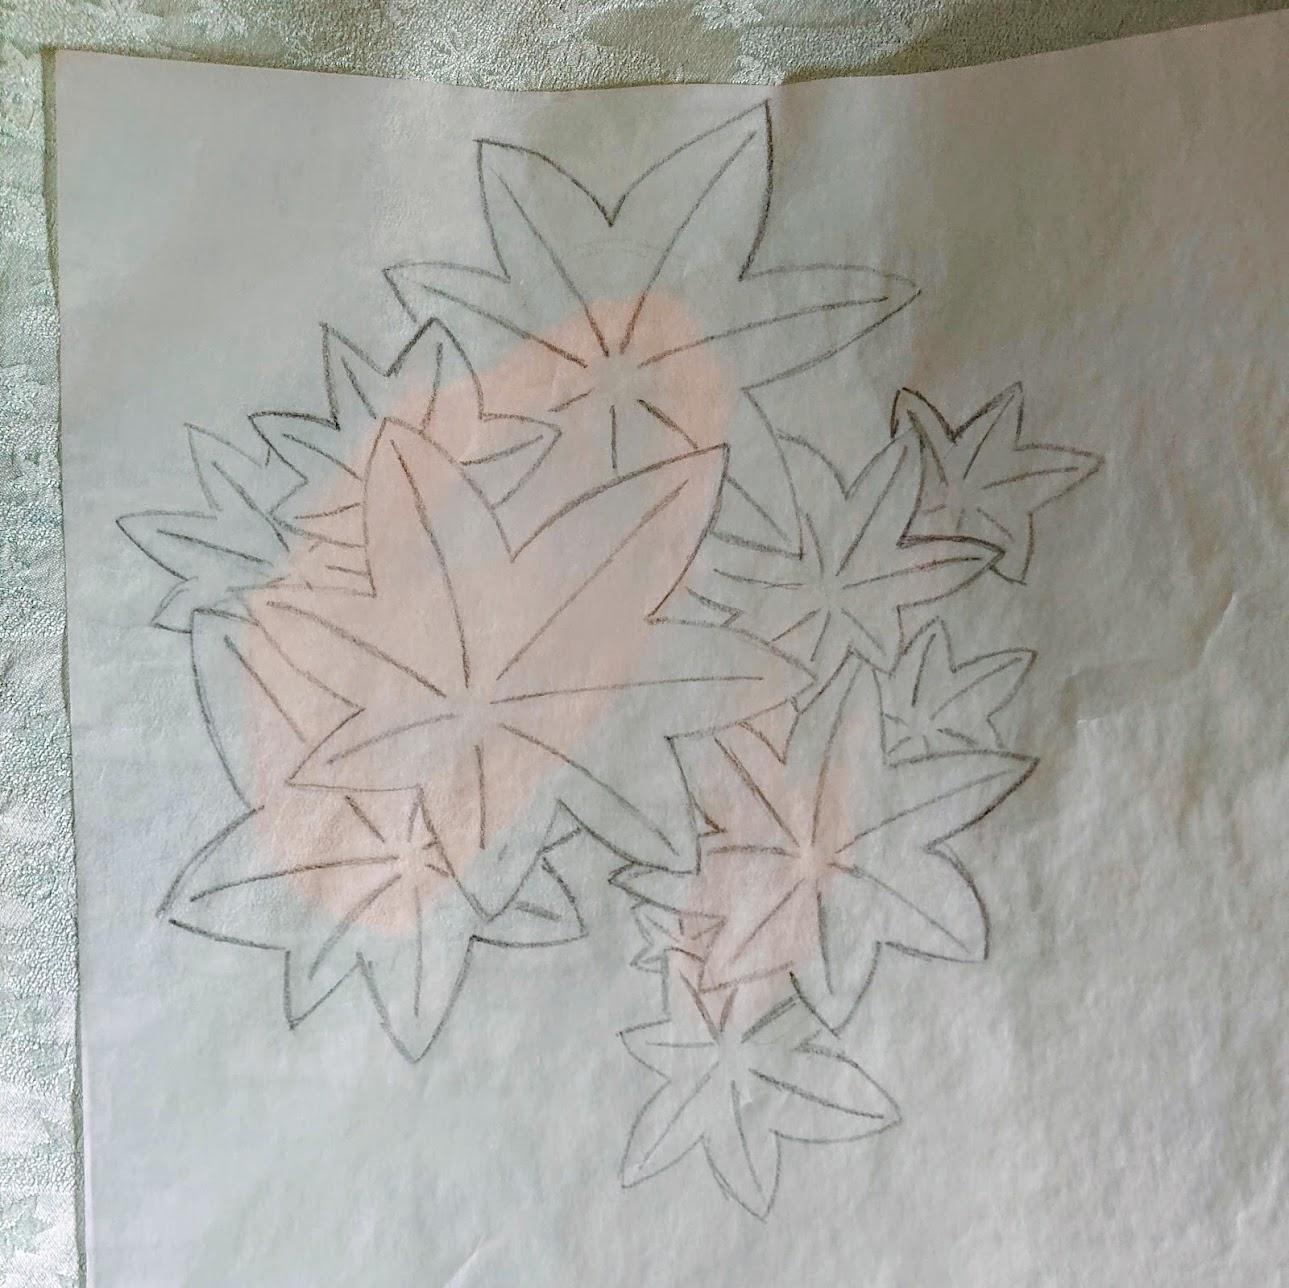 Hand Embroidery Fix on Kimono | FAFAFOOM.COM